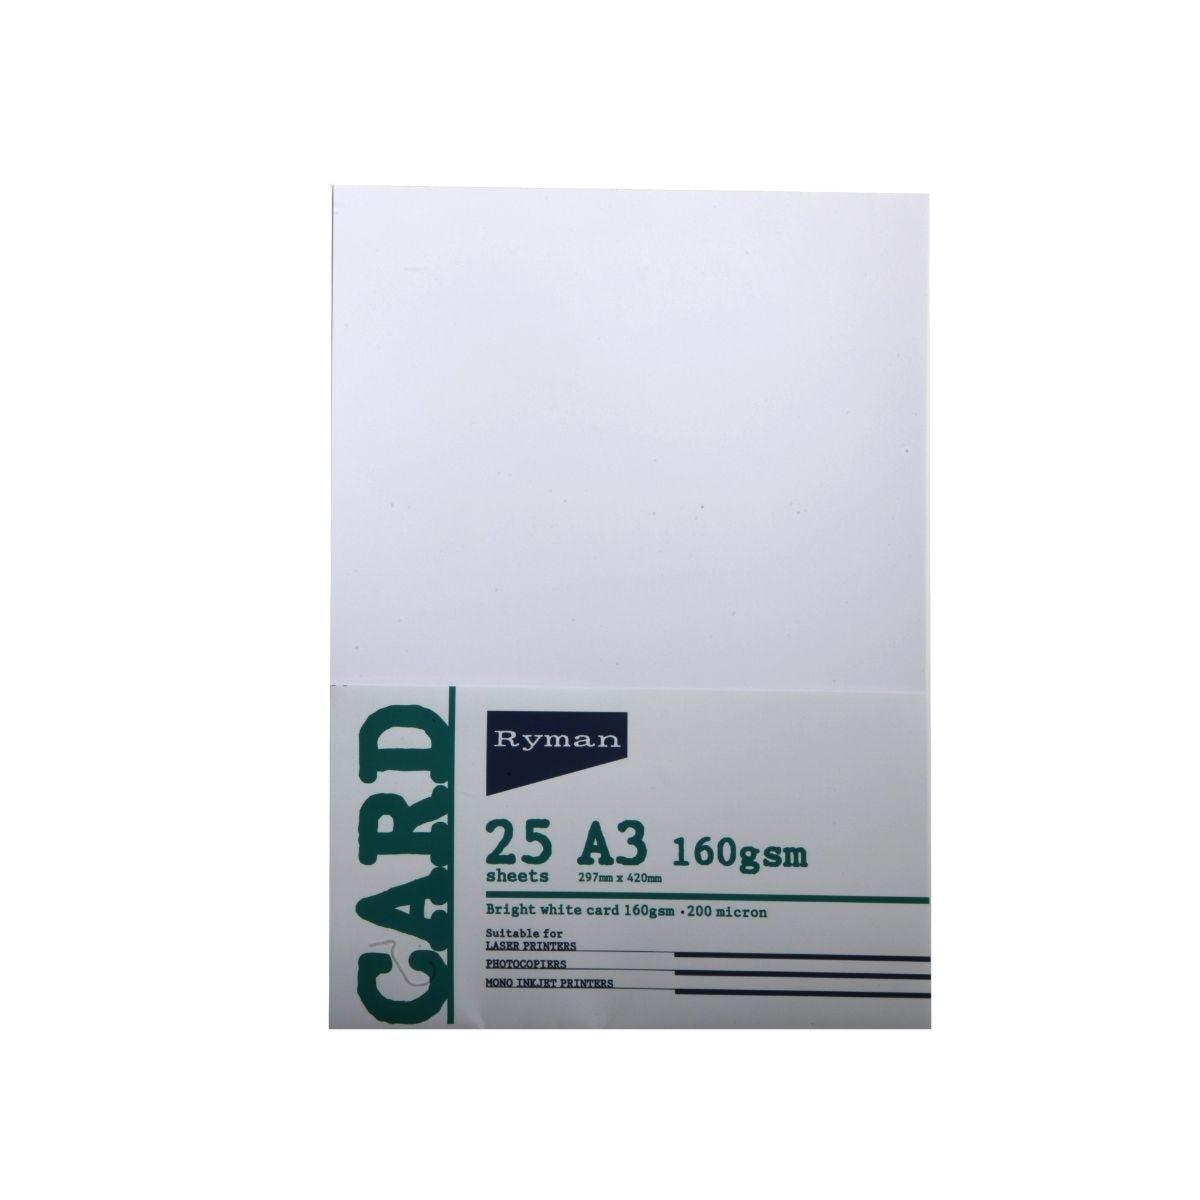 Ryman Card  A3 160gsm 25 Sheets